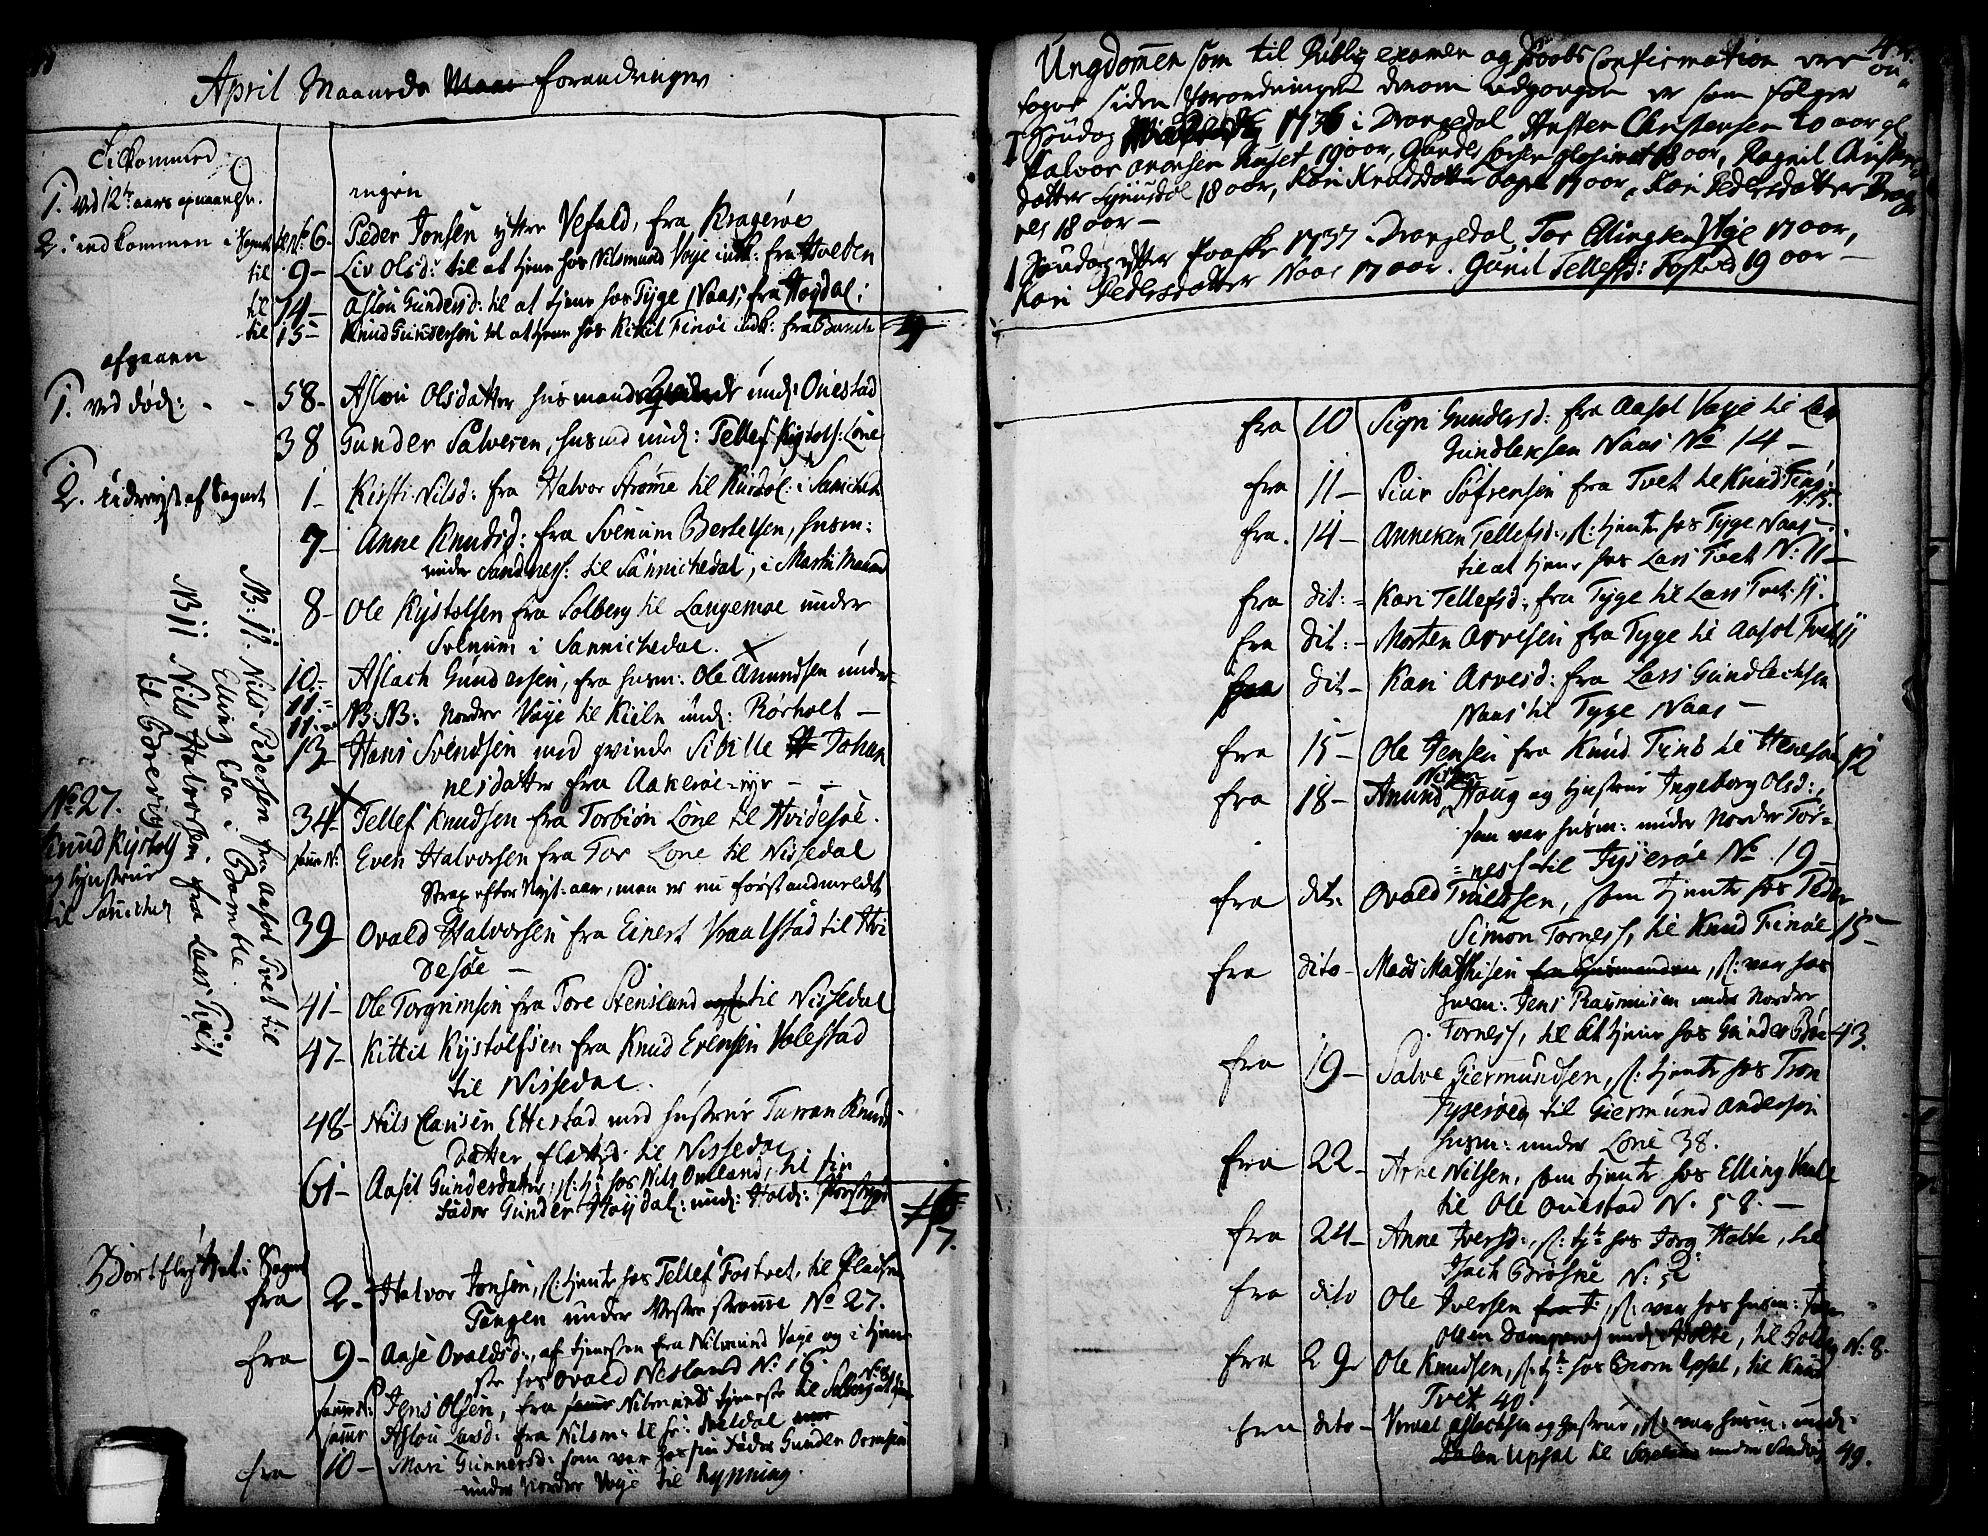 SAKO, Drangedal kirkebøker, F/Fa/L0002: Ministerialbok nr. 2, 1733-1753, s. 41-42